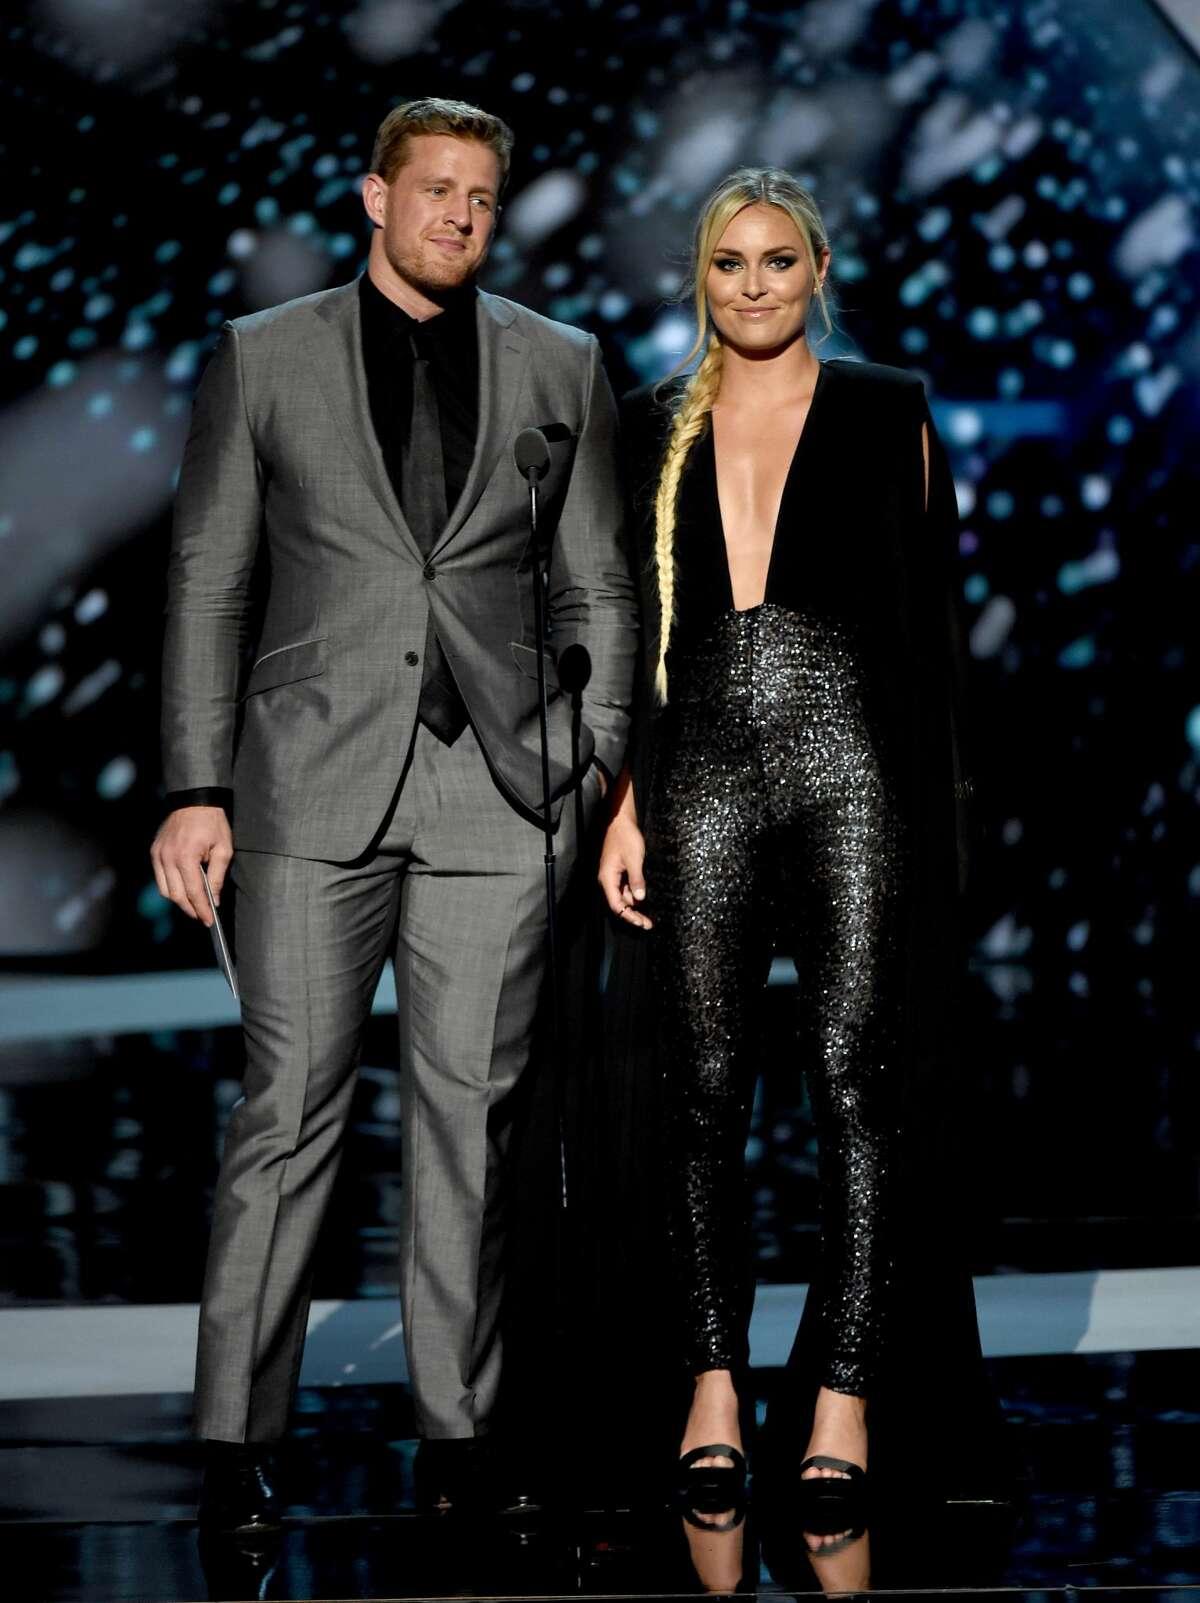 Best: J.J. Watt and Lindsey Vonn achieve the highest level of gleaming fashion. Vonn's slinky bodysuit turns her into an athletic, glamorous vampire woman.